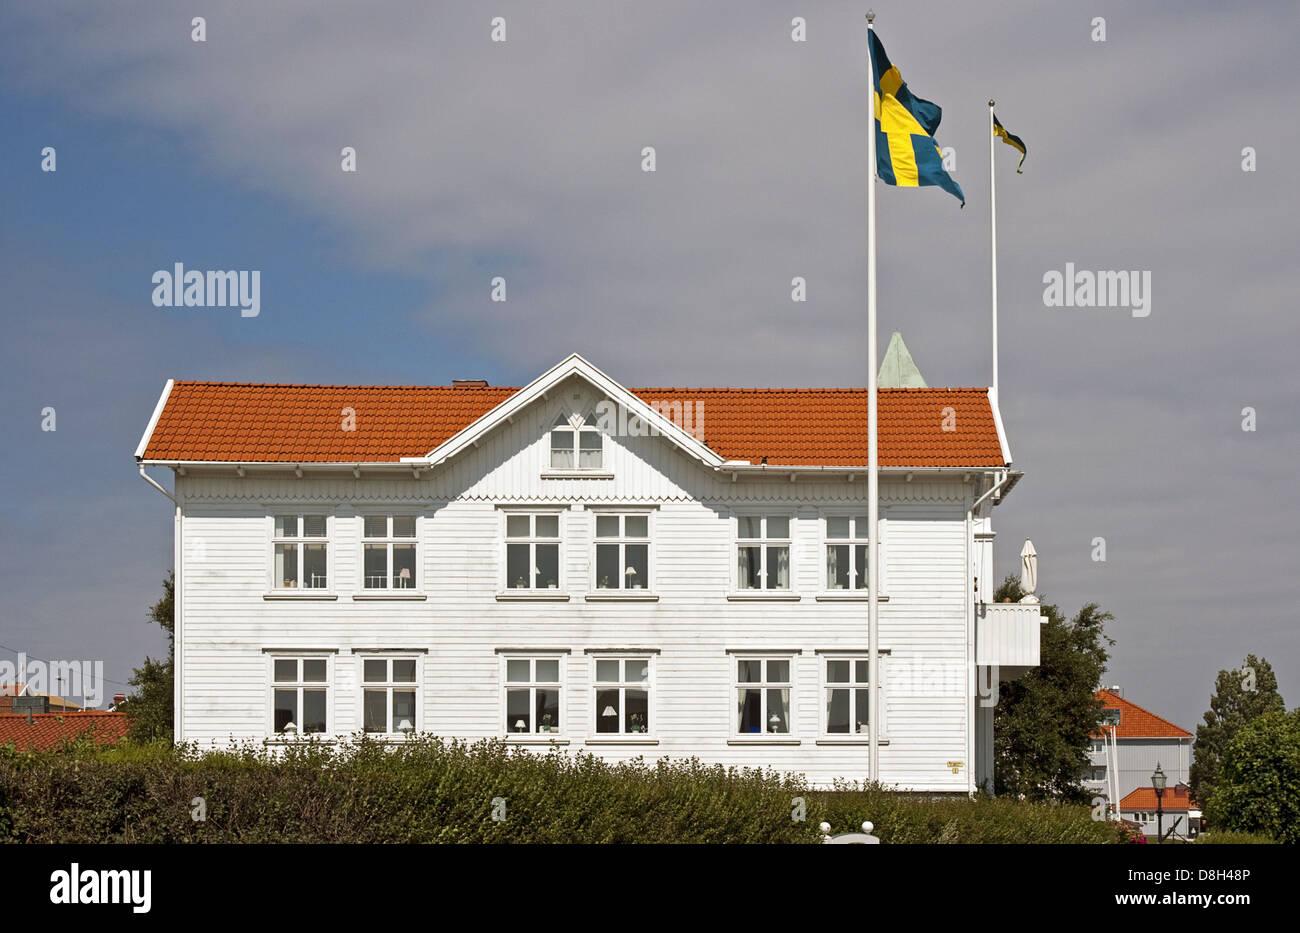 Swedish villa - Stock Image